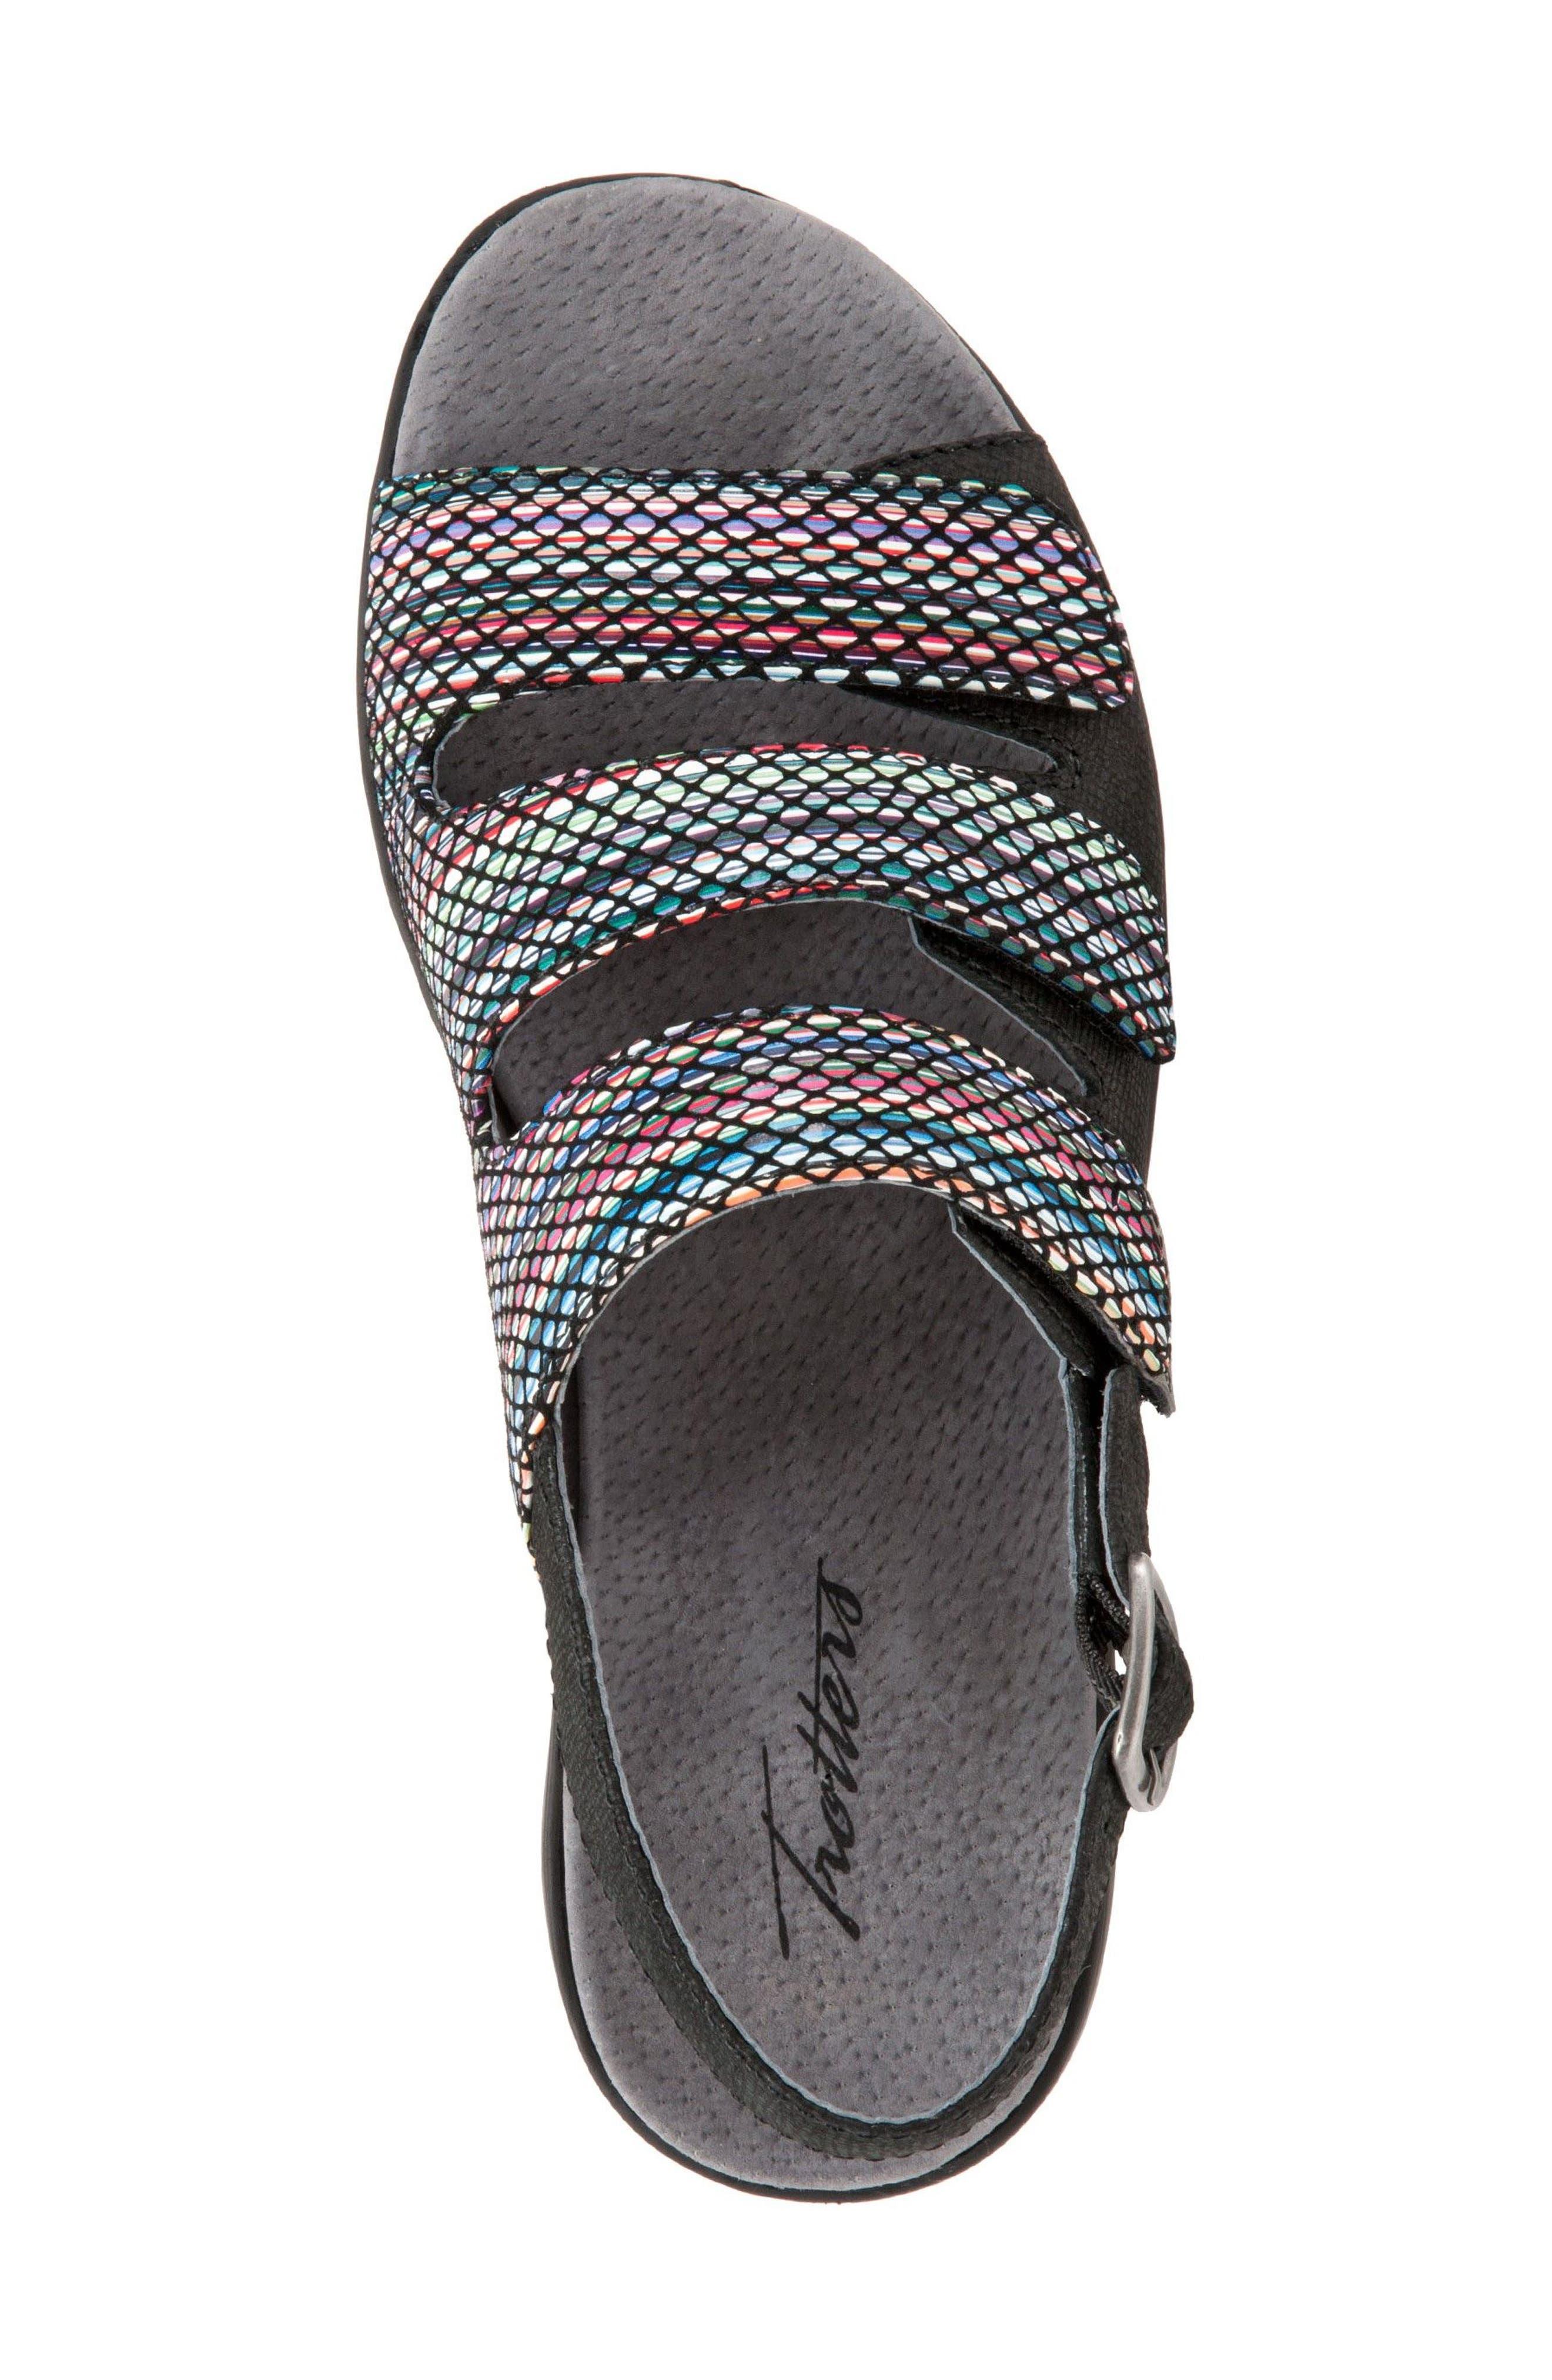 Kendra Strappy Slingback Sandal,                             Alternate thumbnail 10, color,